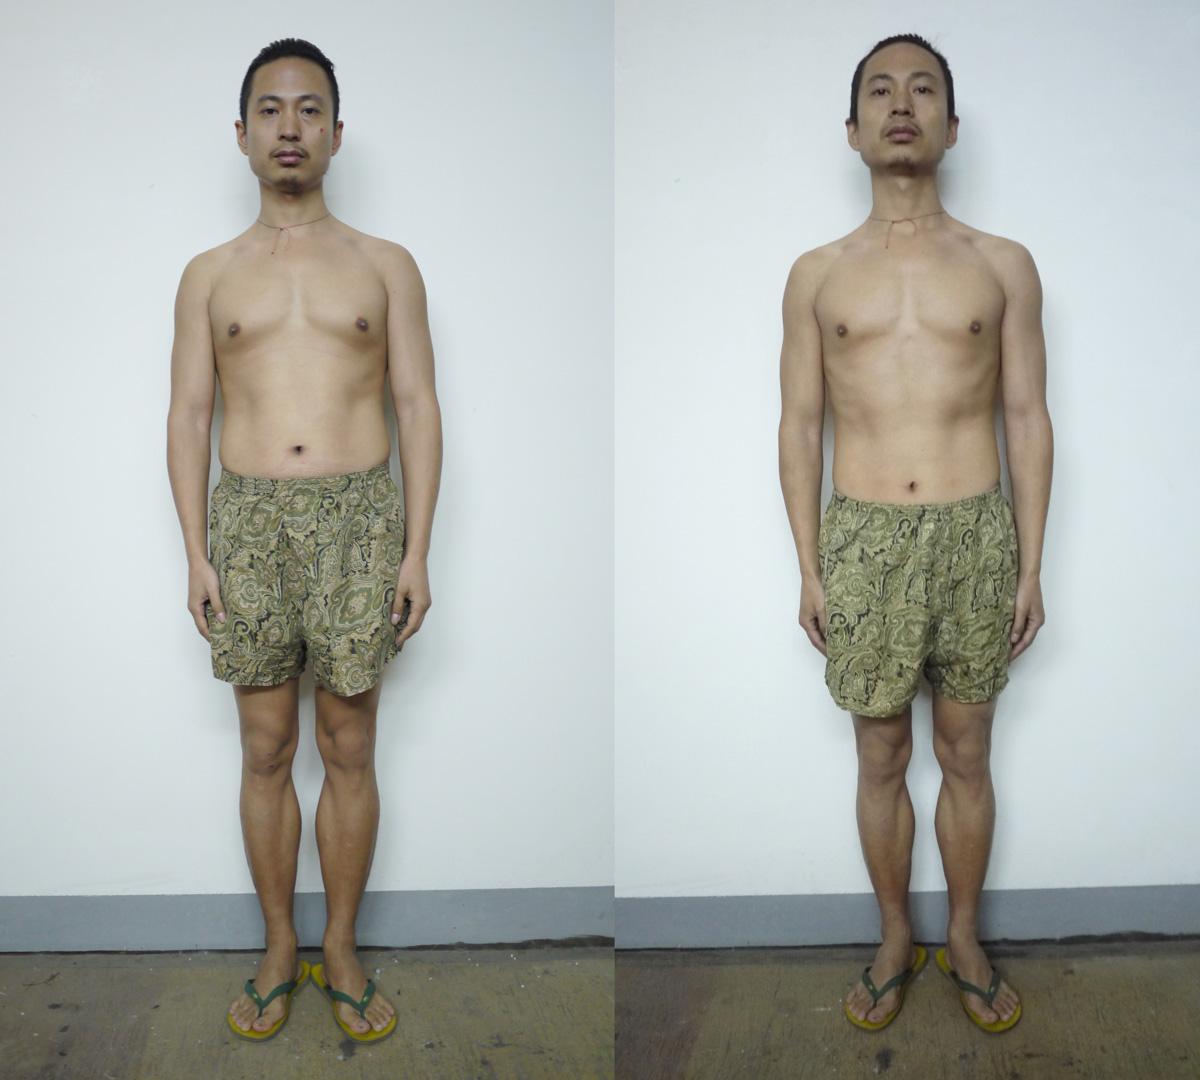 Weight-Loss-Plan-2011-courtesy-Klein-Sun-Gallery-c-Li-Liao-.jpg